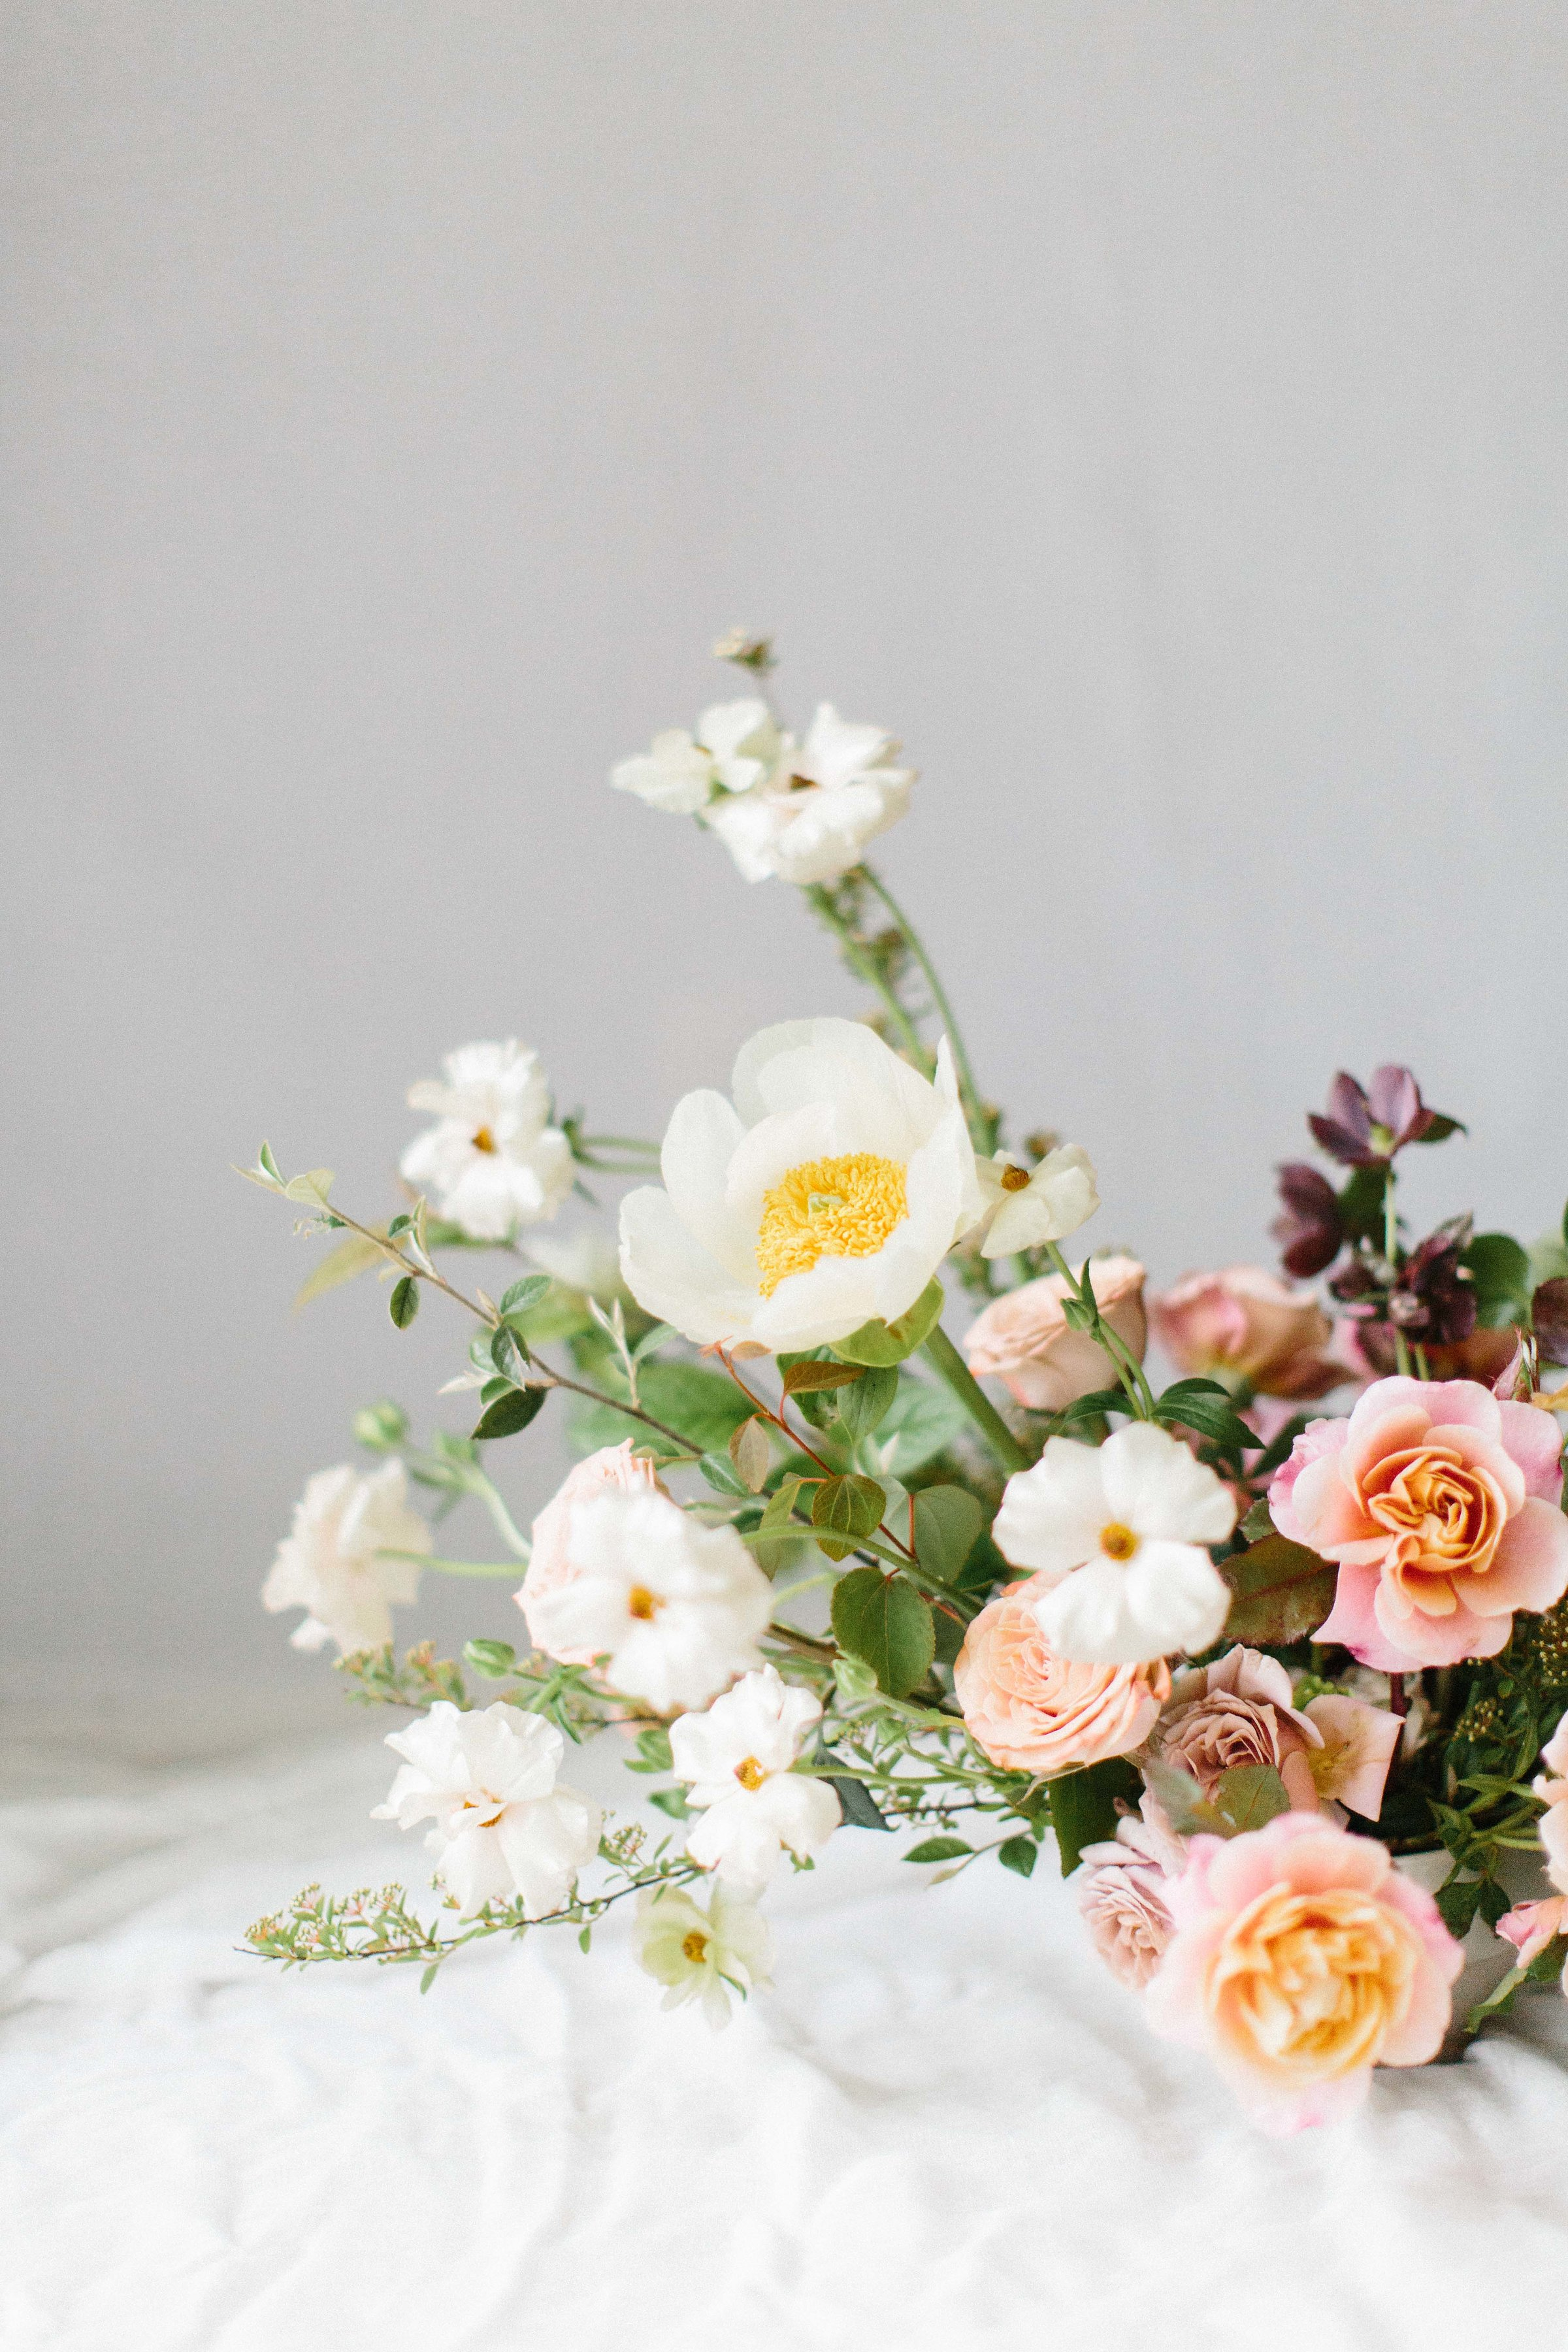 Grace+Blooms-6.jpg